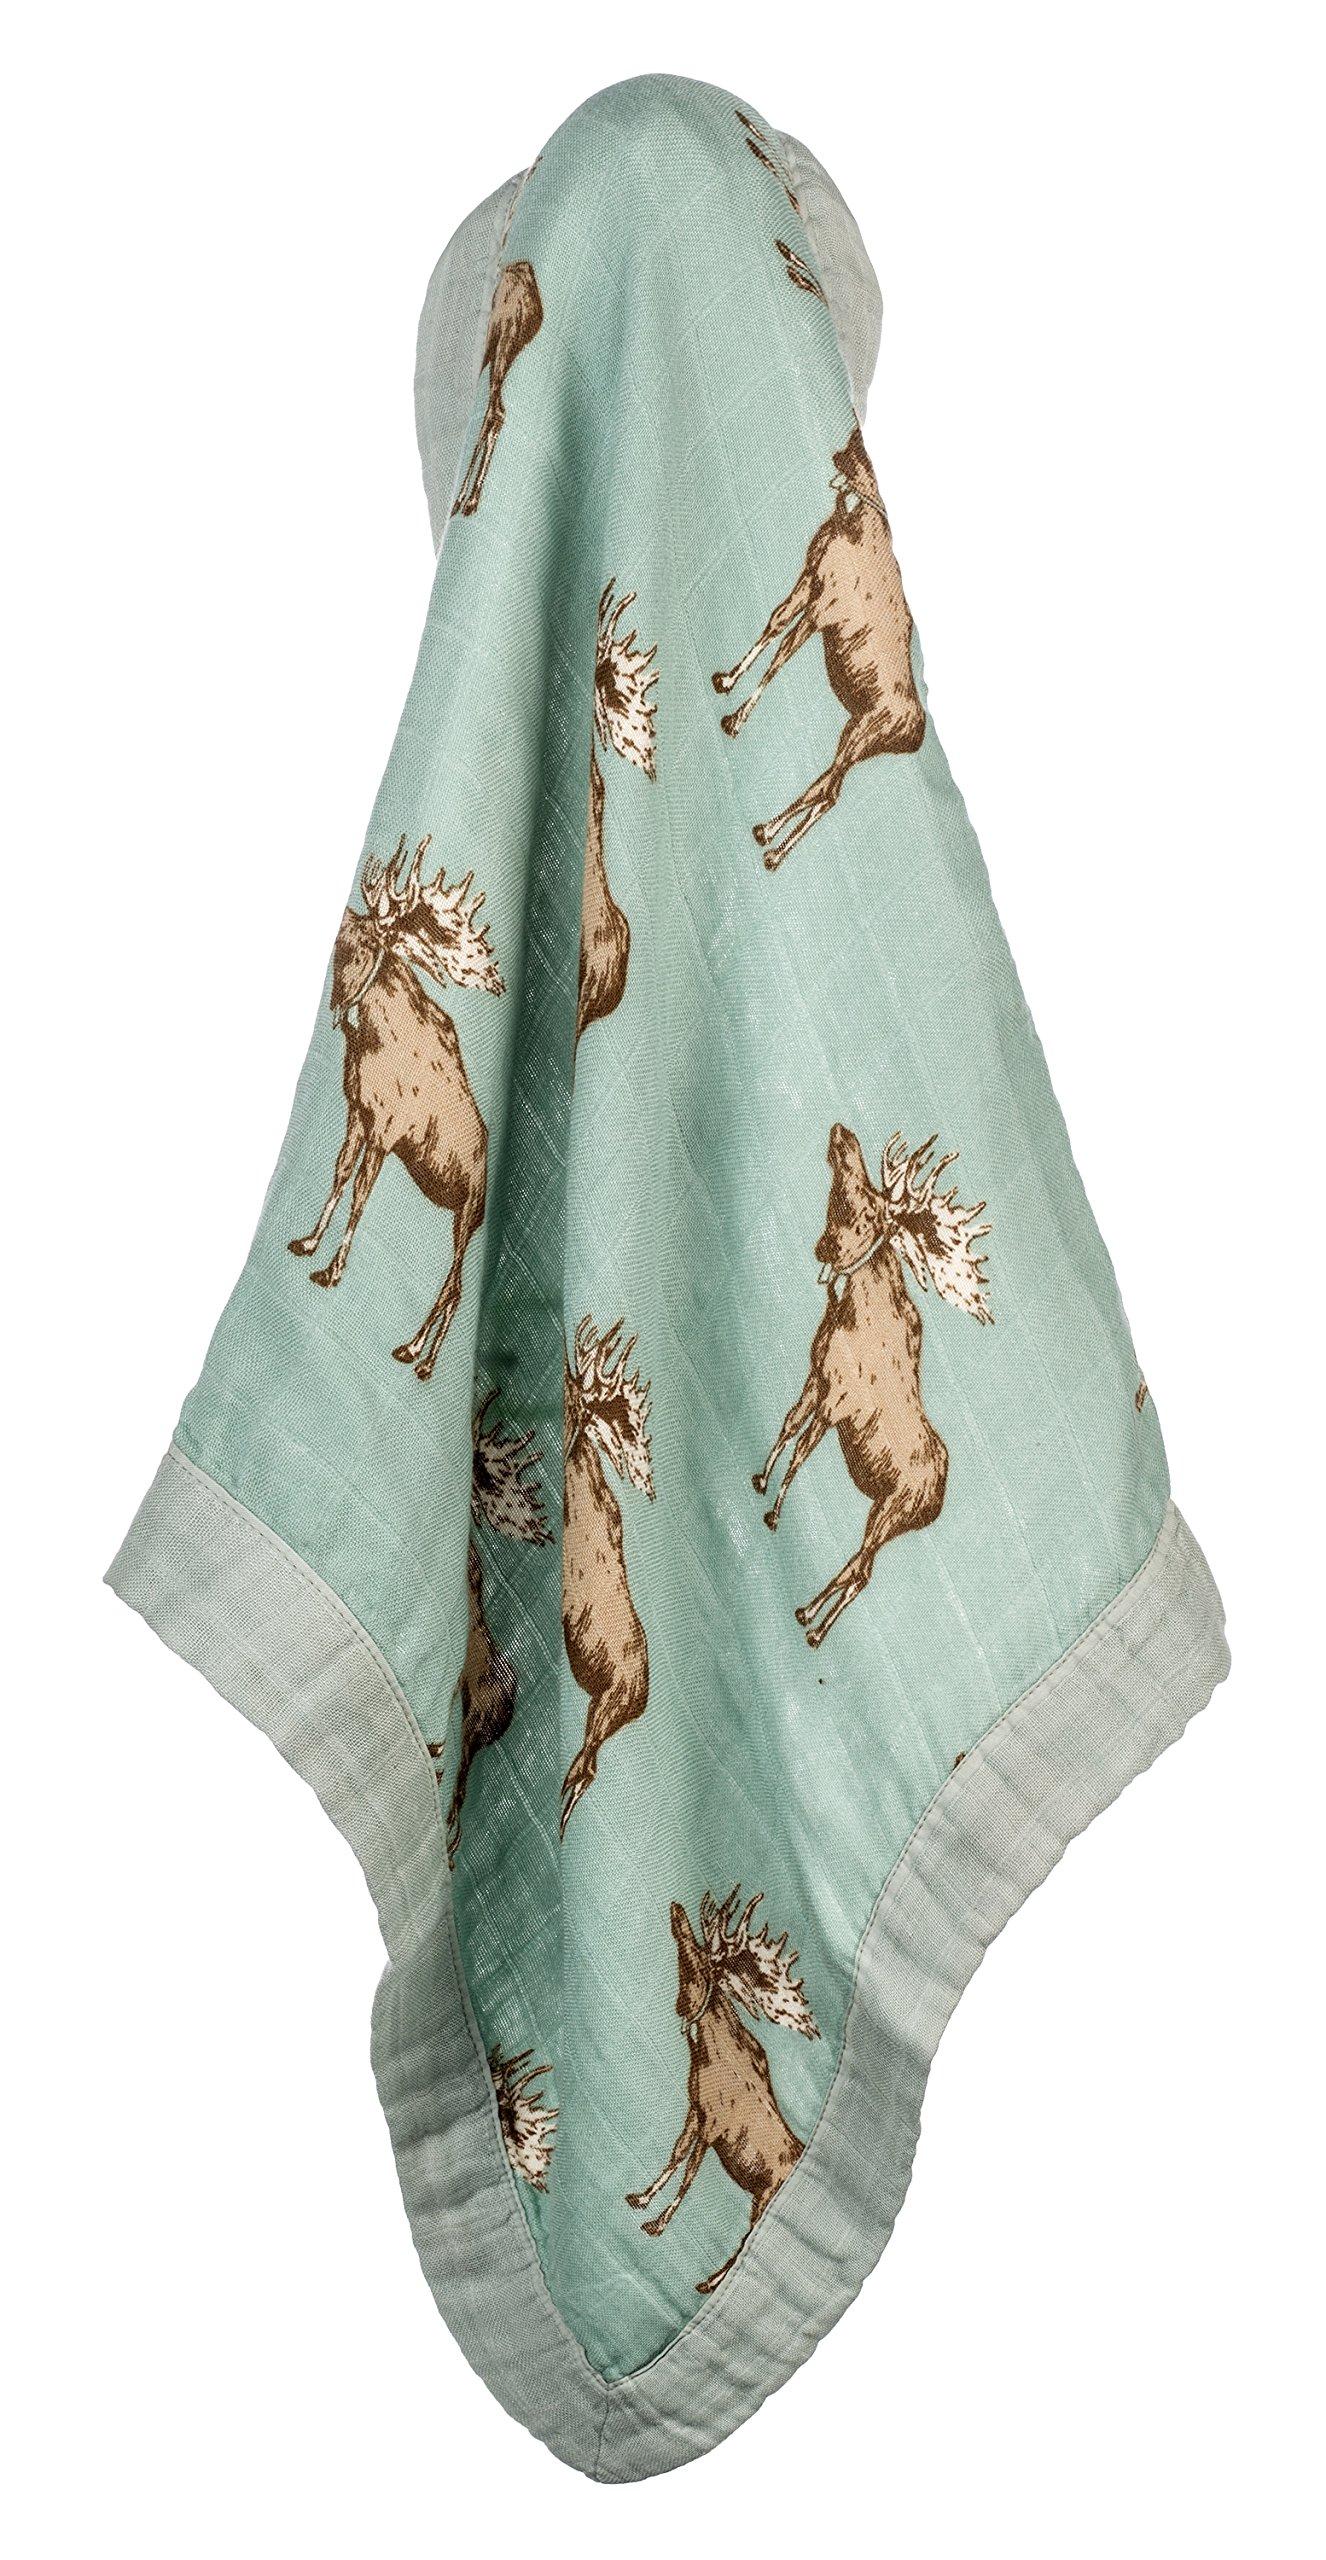 Milkbarn Mini Lovey Baby Blanket - Blue Buck 65068